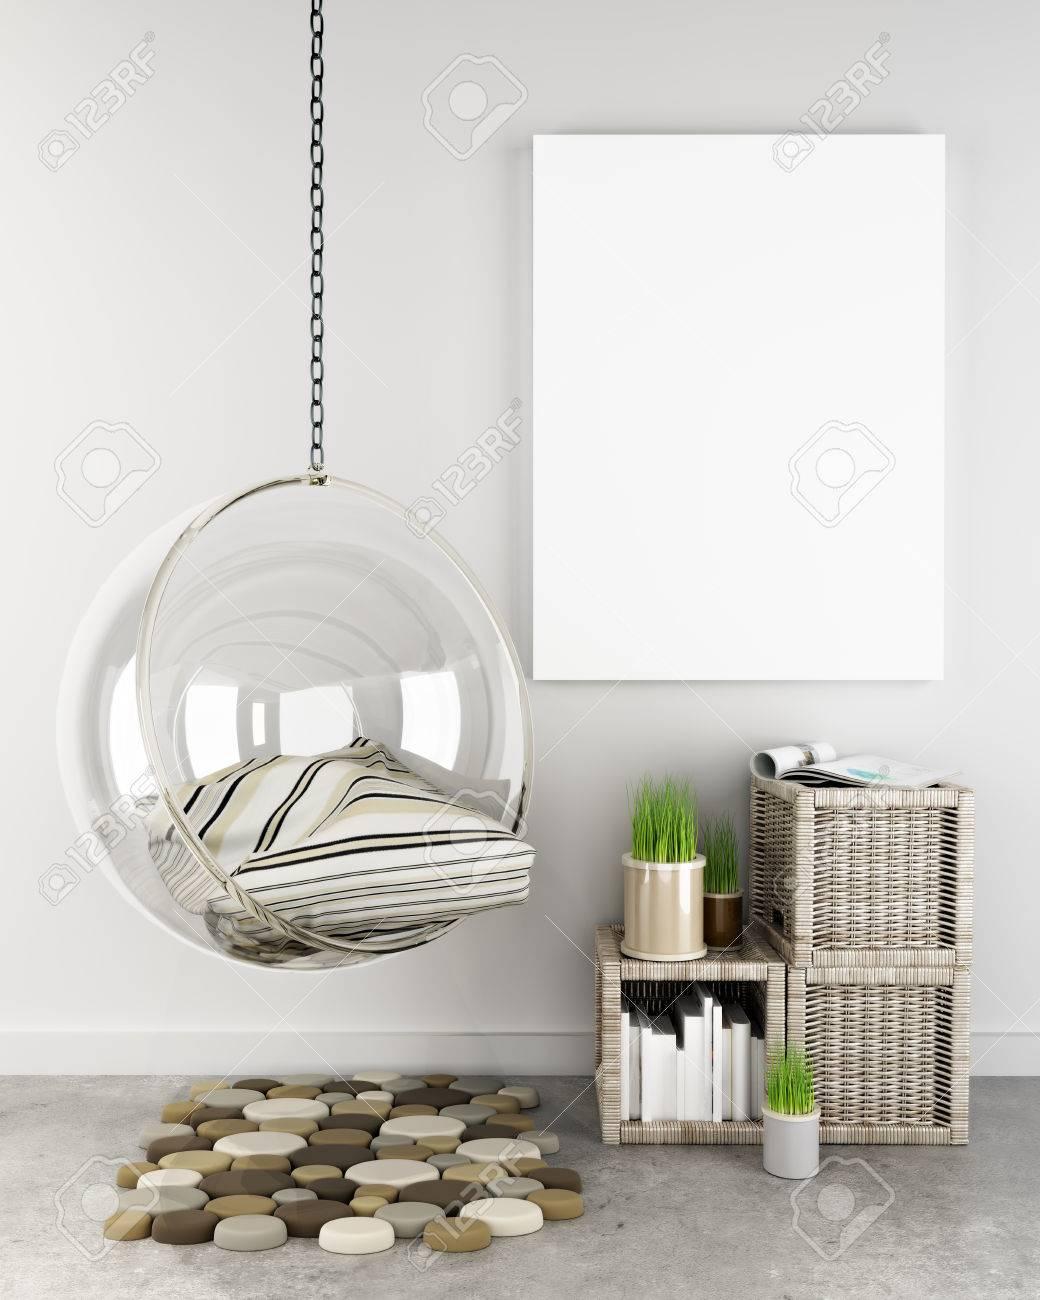 Mock up poster in hipster interior background, Photo realistic 3D render scene. Standard-Bild - 46050650